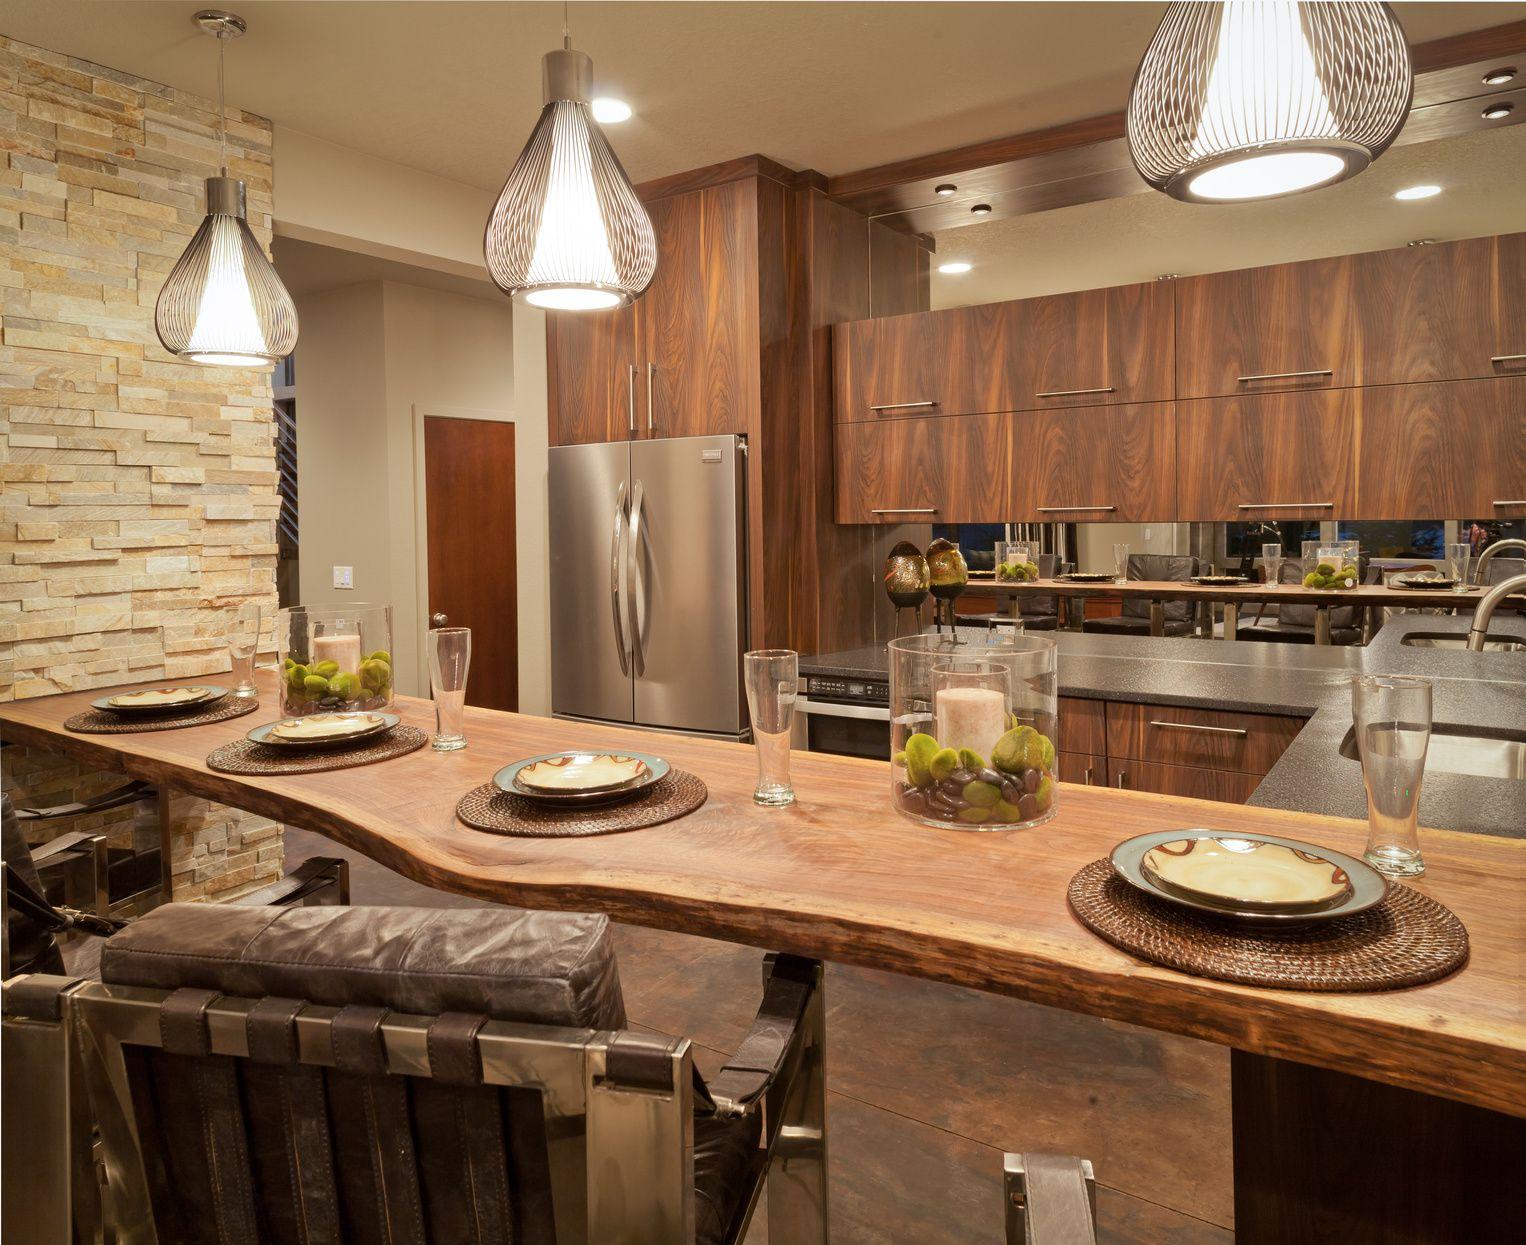 Luxuriöse Küche im rustikalen Look | Küche | Pinterest | Rustikal ...